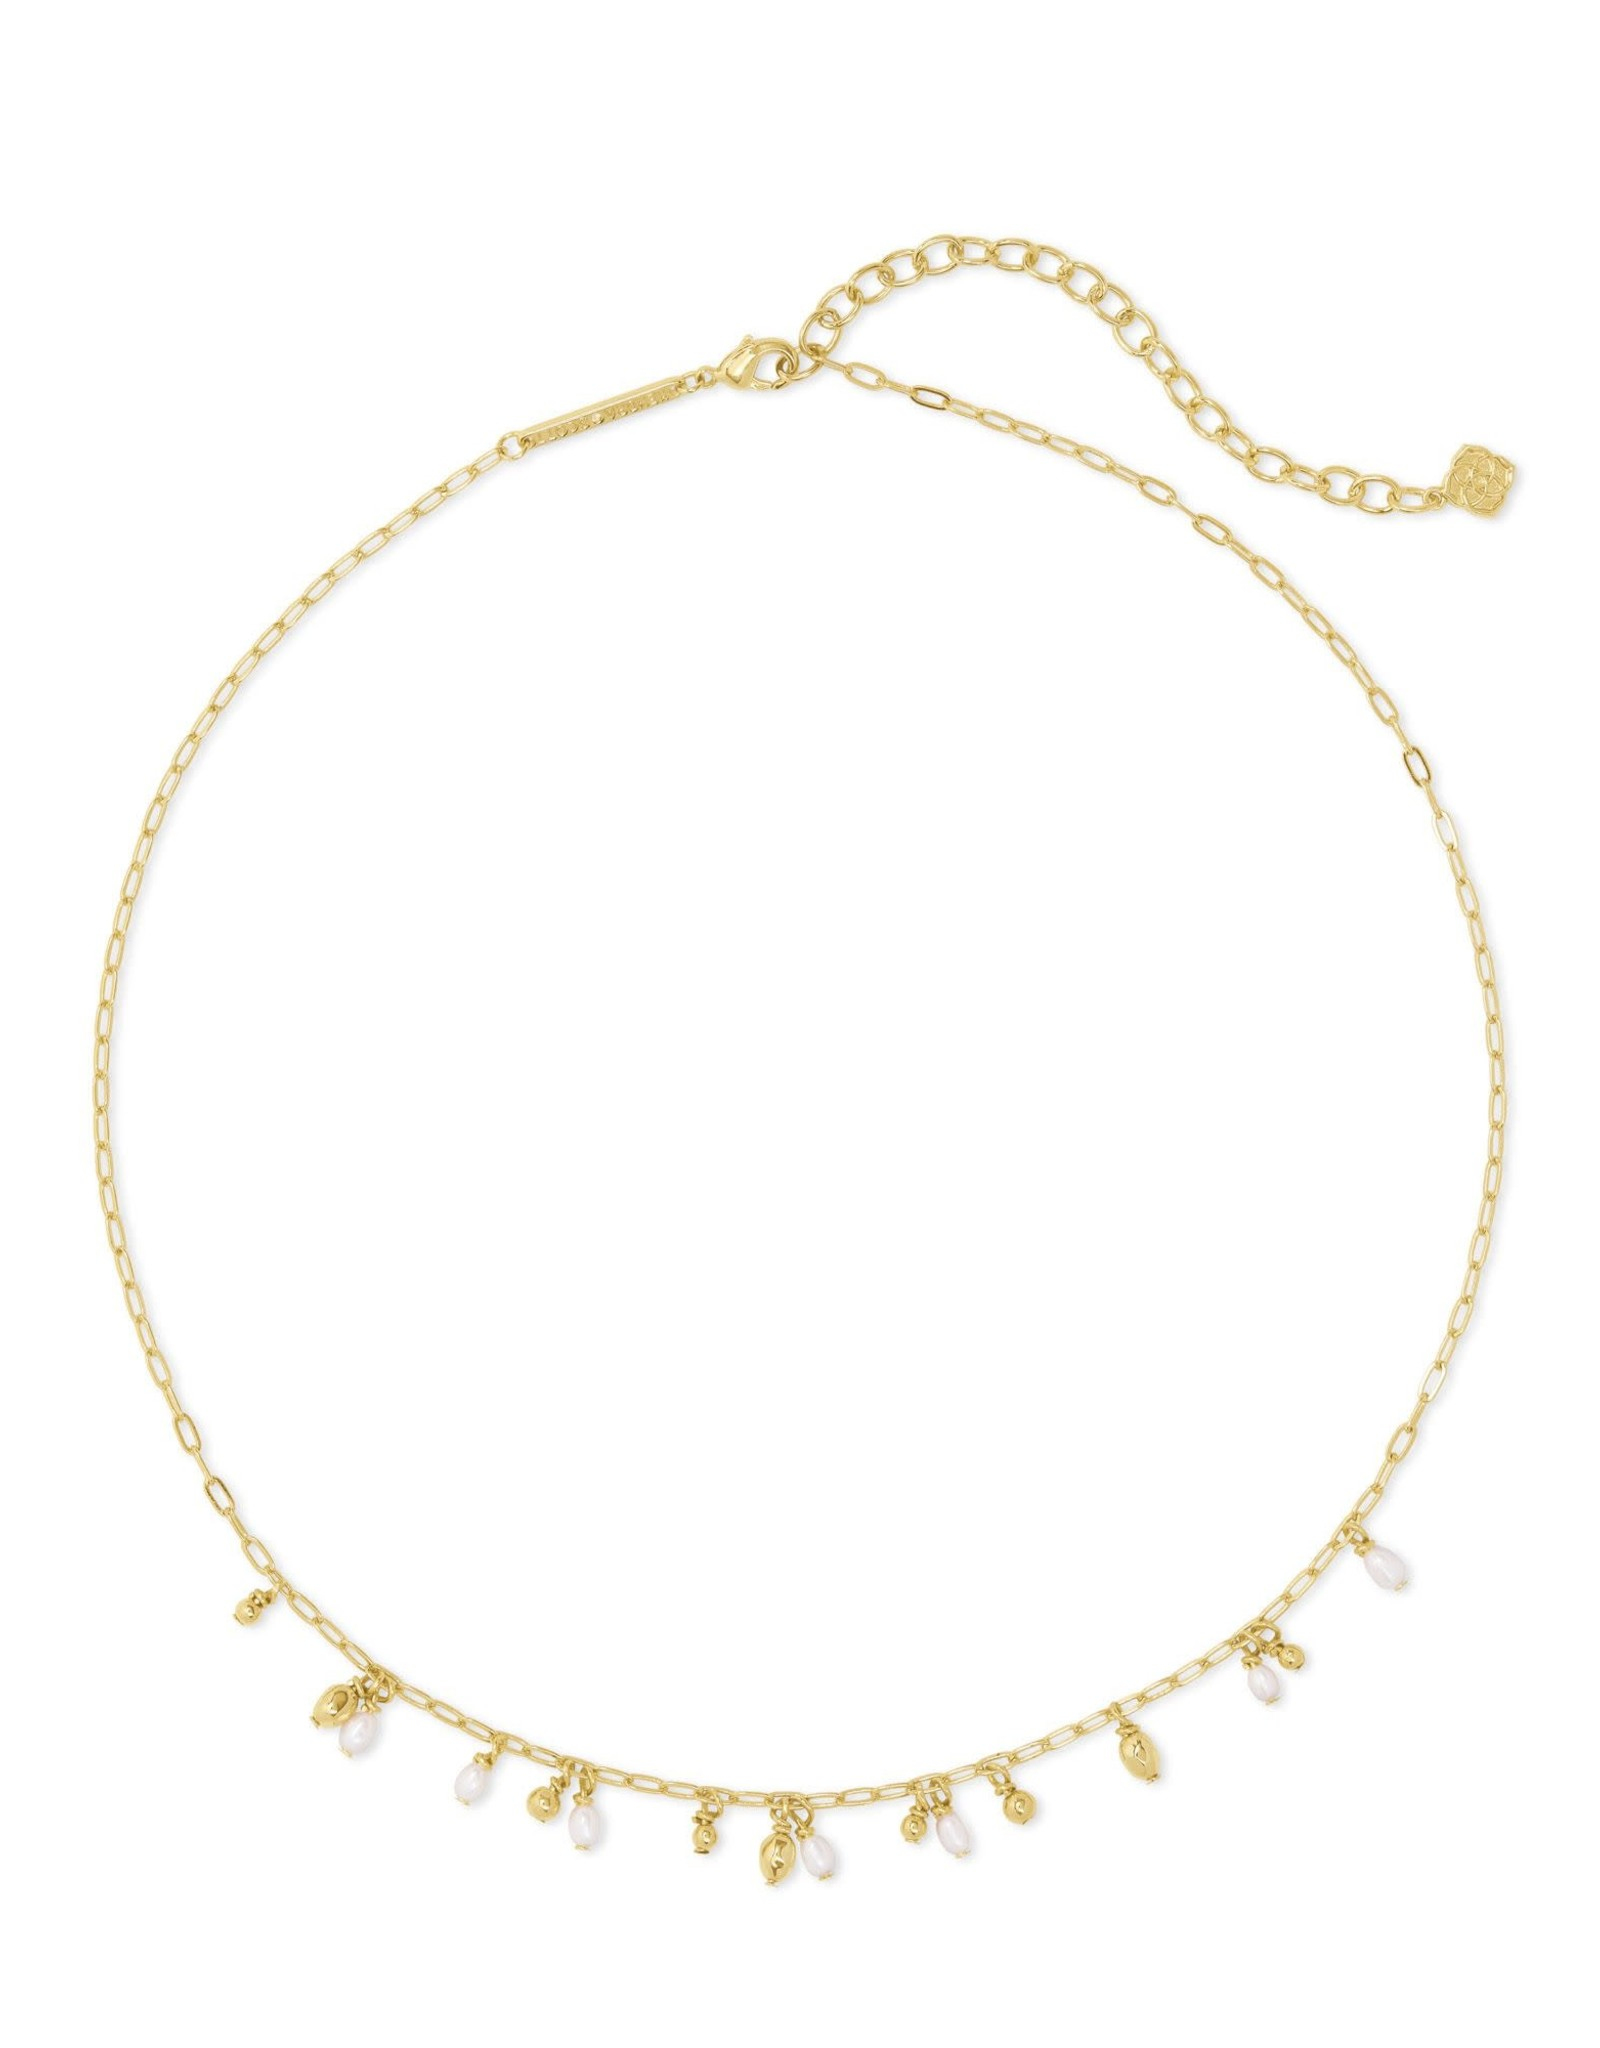 Kendra Scott Mollie Choker Necklace - White Pearl/Gold